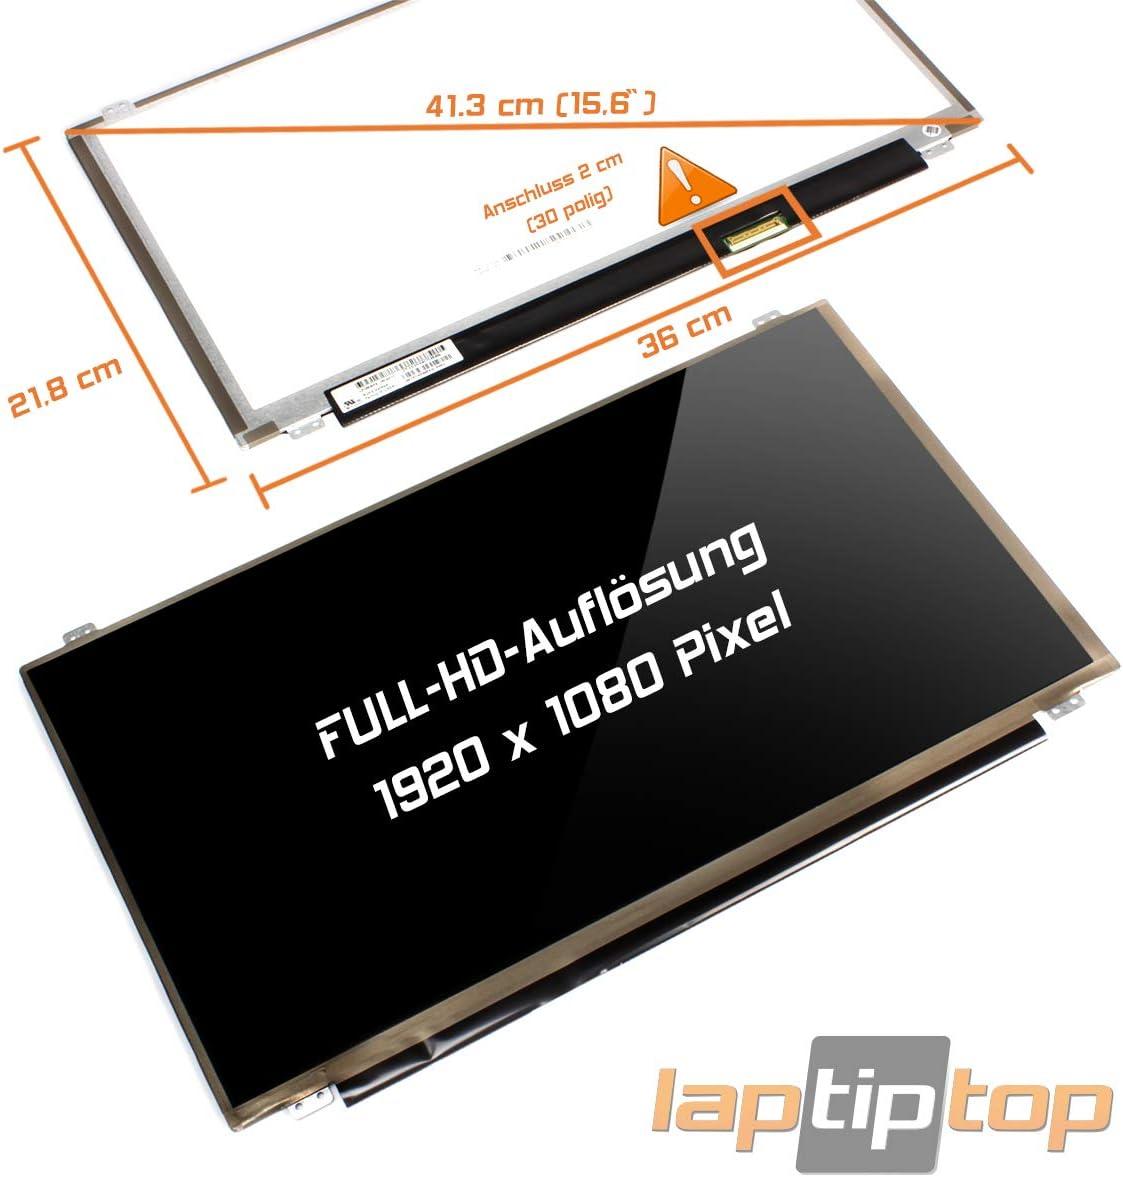 Laptiptop 15,6 LED Display Screen Glossy Ersatz f/ür Lenovo ThinkPad Edge E540 20C6003AGE FHD Bildschirm Panel